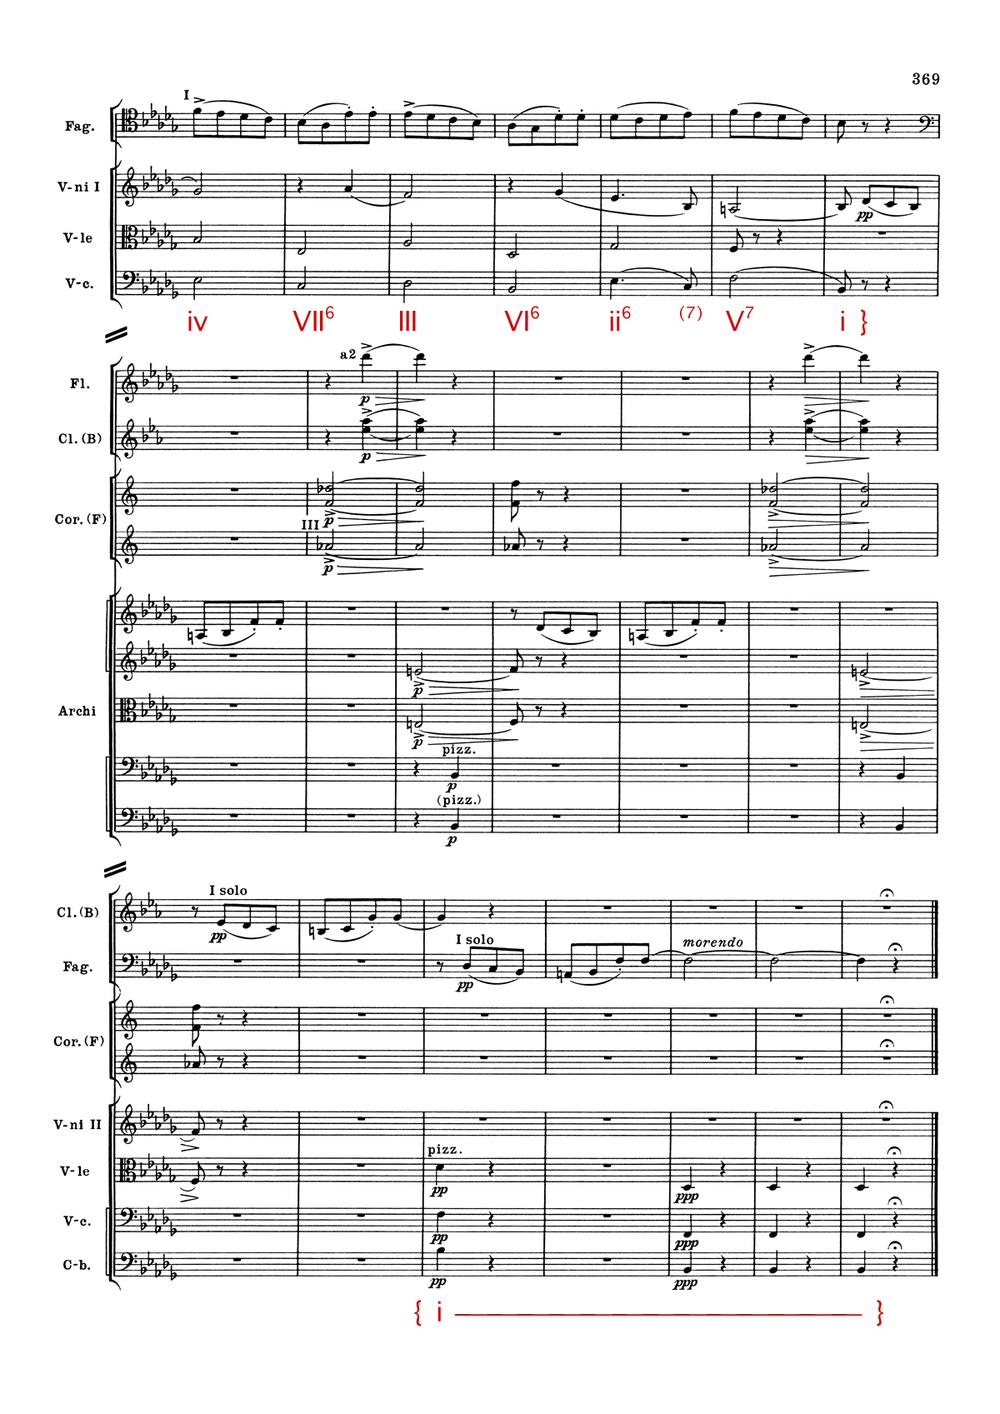 Tchaikovsky 4 theory_2.jpg